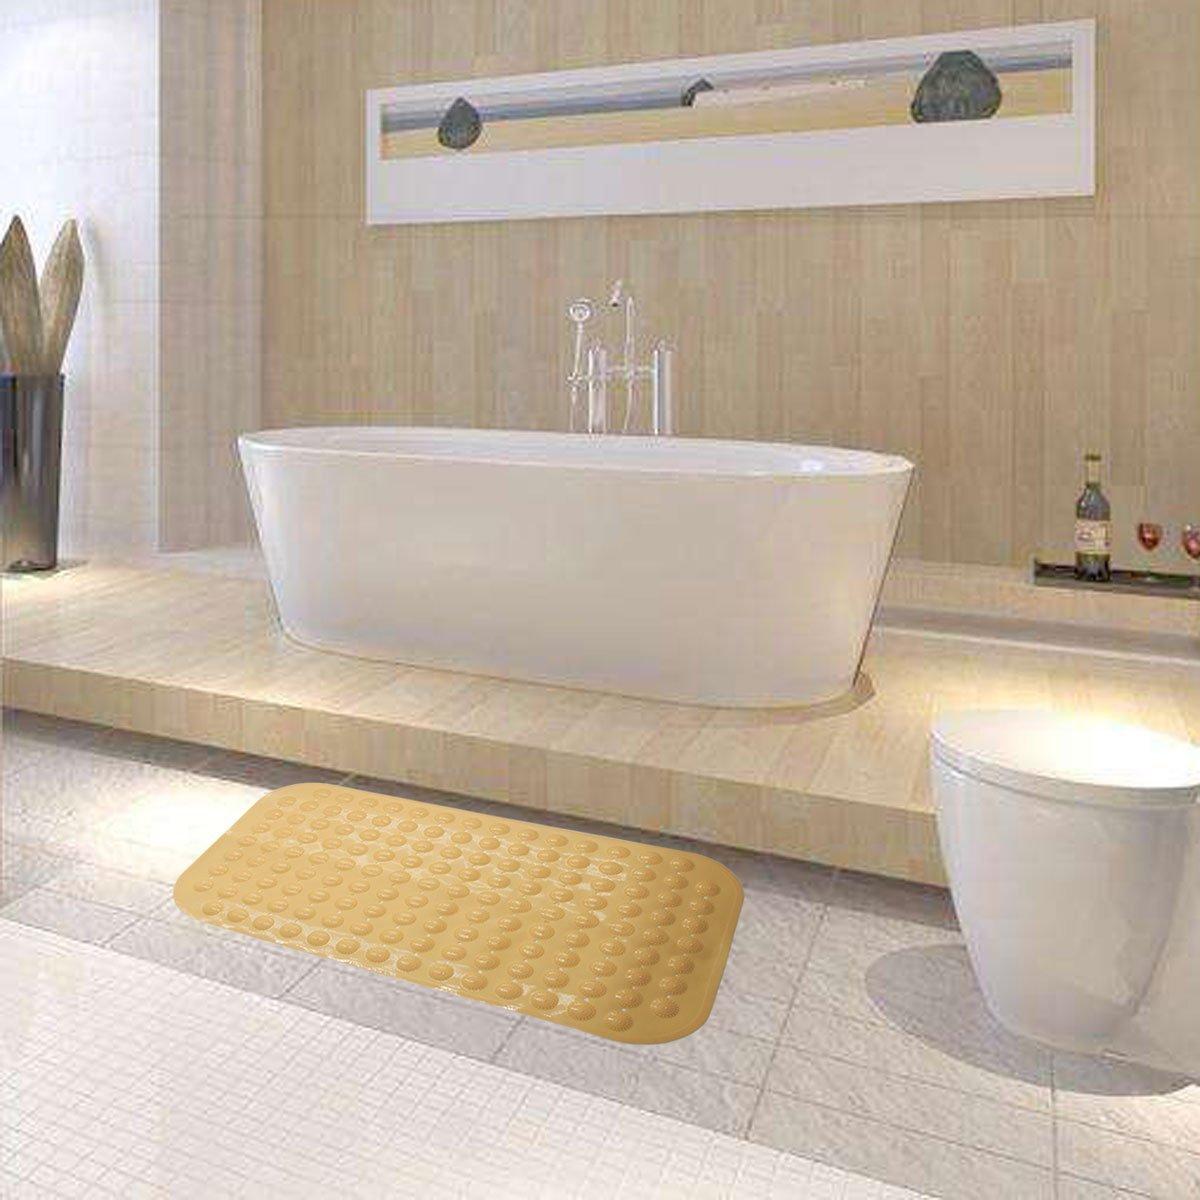 Home & Garden Extra Long Bath Tub Mat Vinyl Anti Slip Non Slide Safety Skid Shower Protection Cheap Sales 50% Non-slip Appliques & Mats